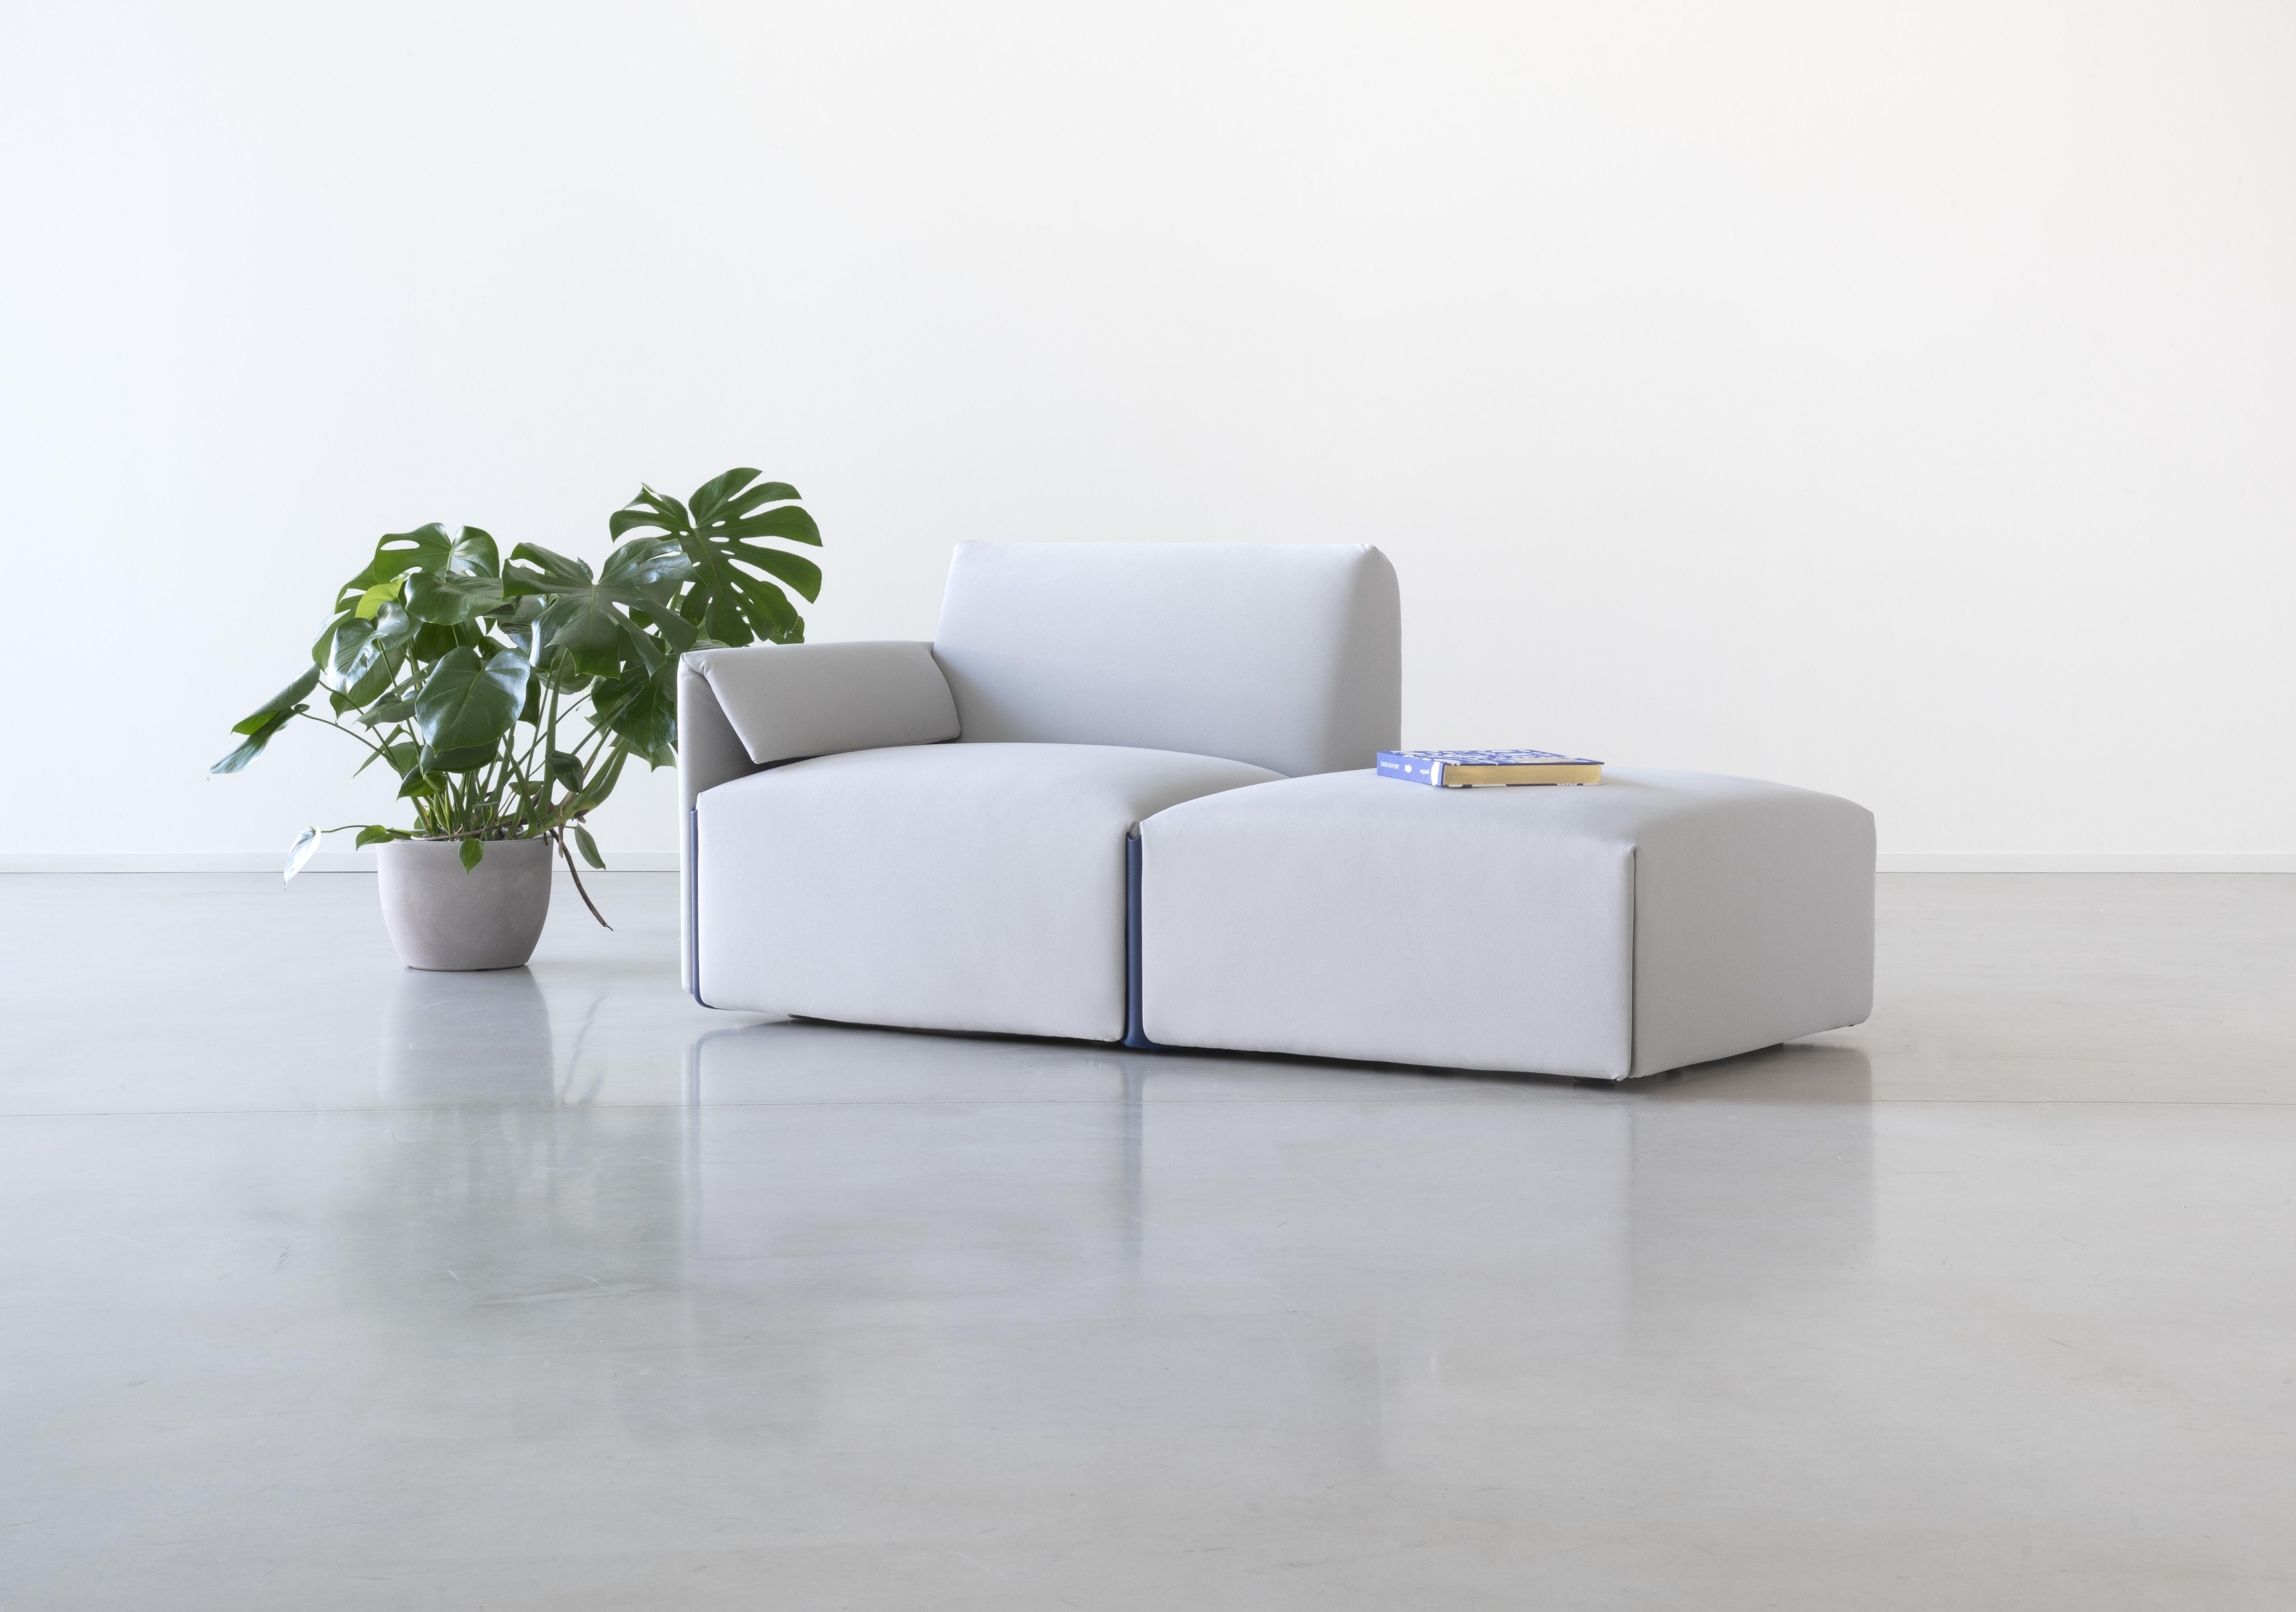 Stefan Diez assina sistema de sofá modular Costume para Magis.